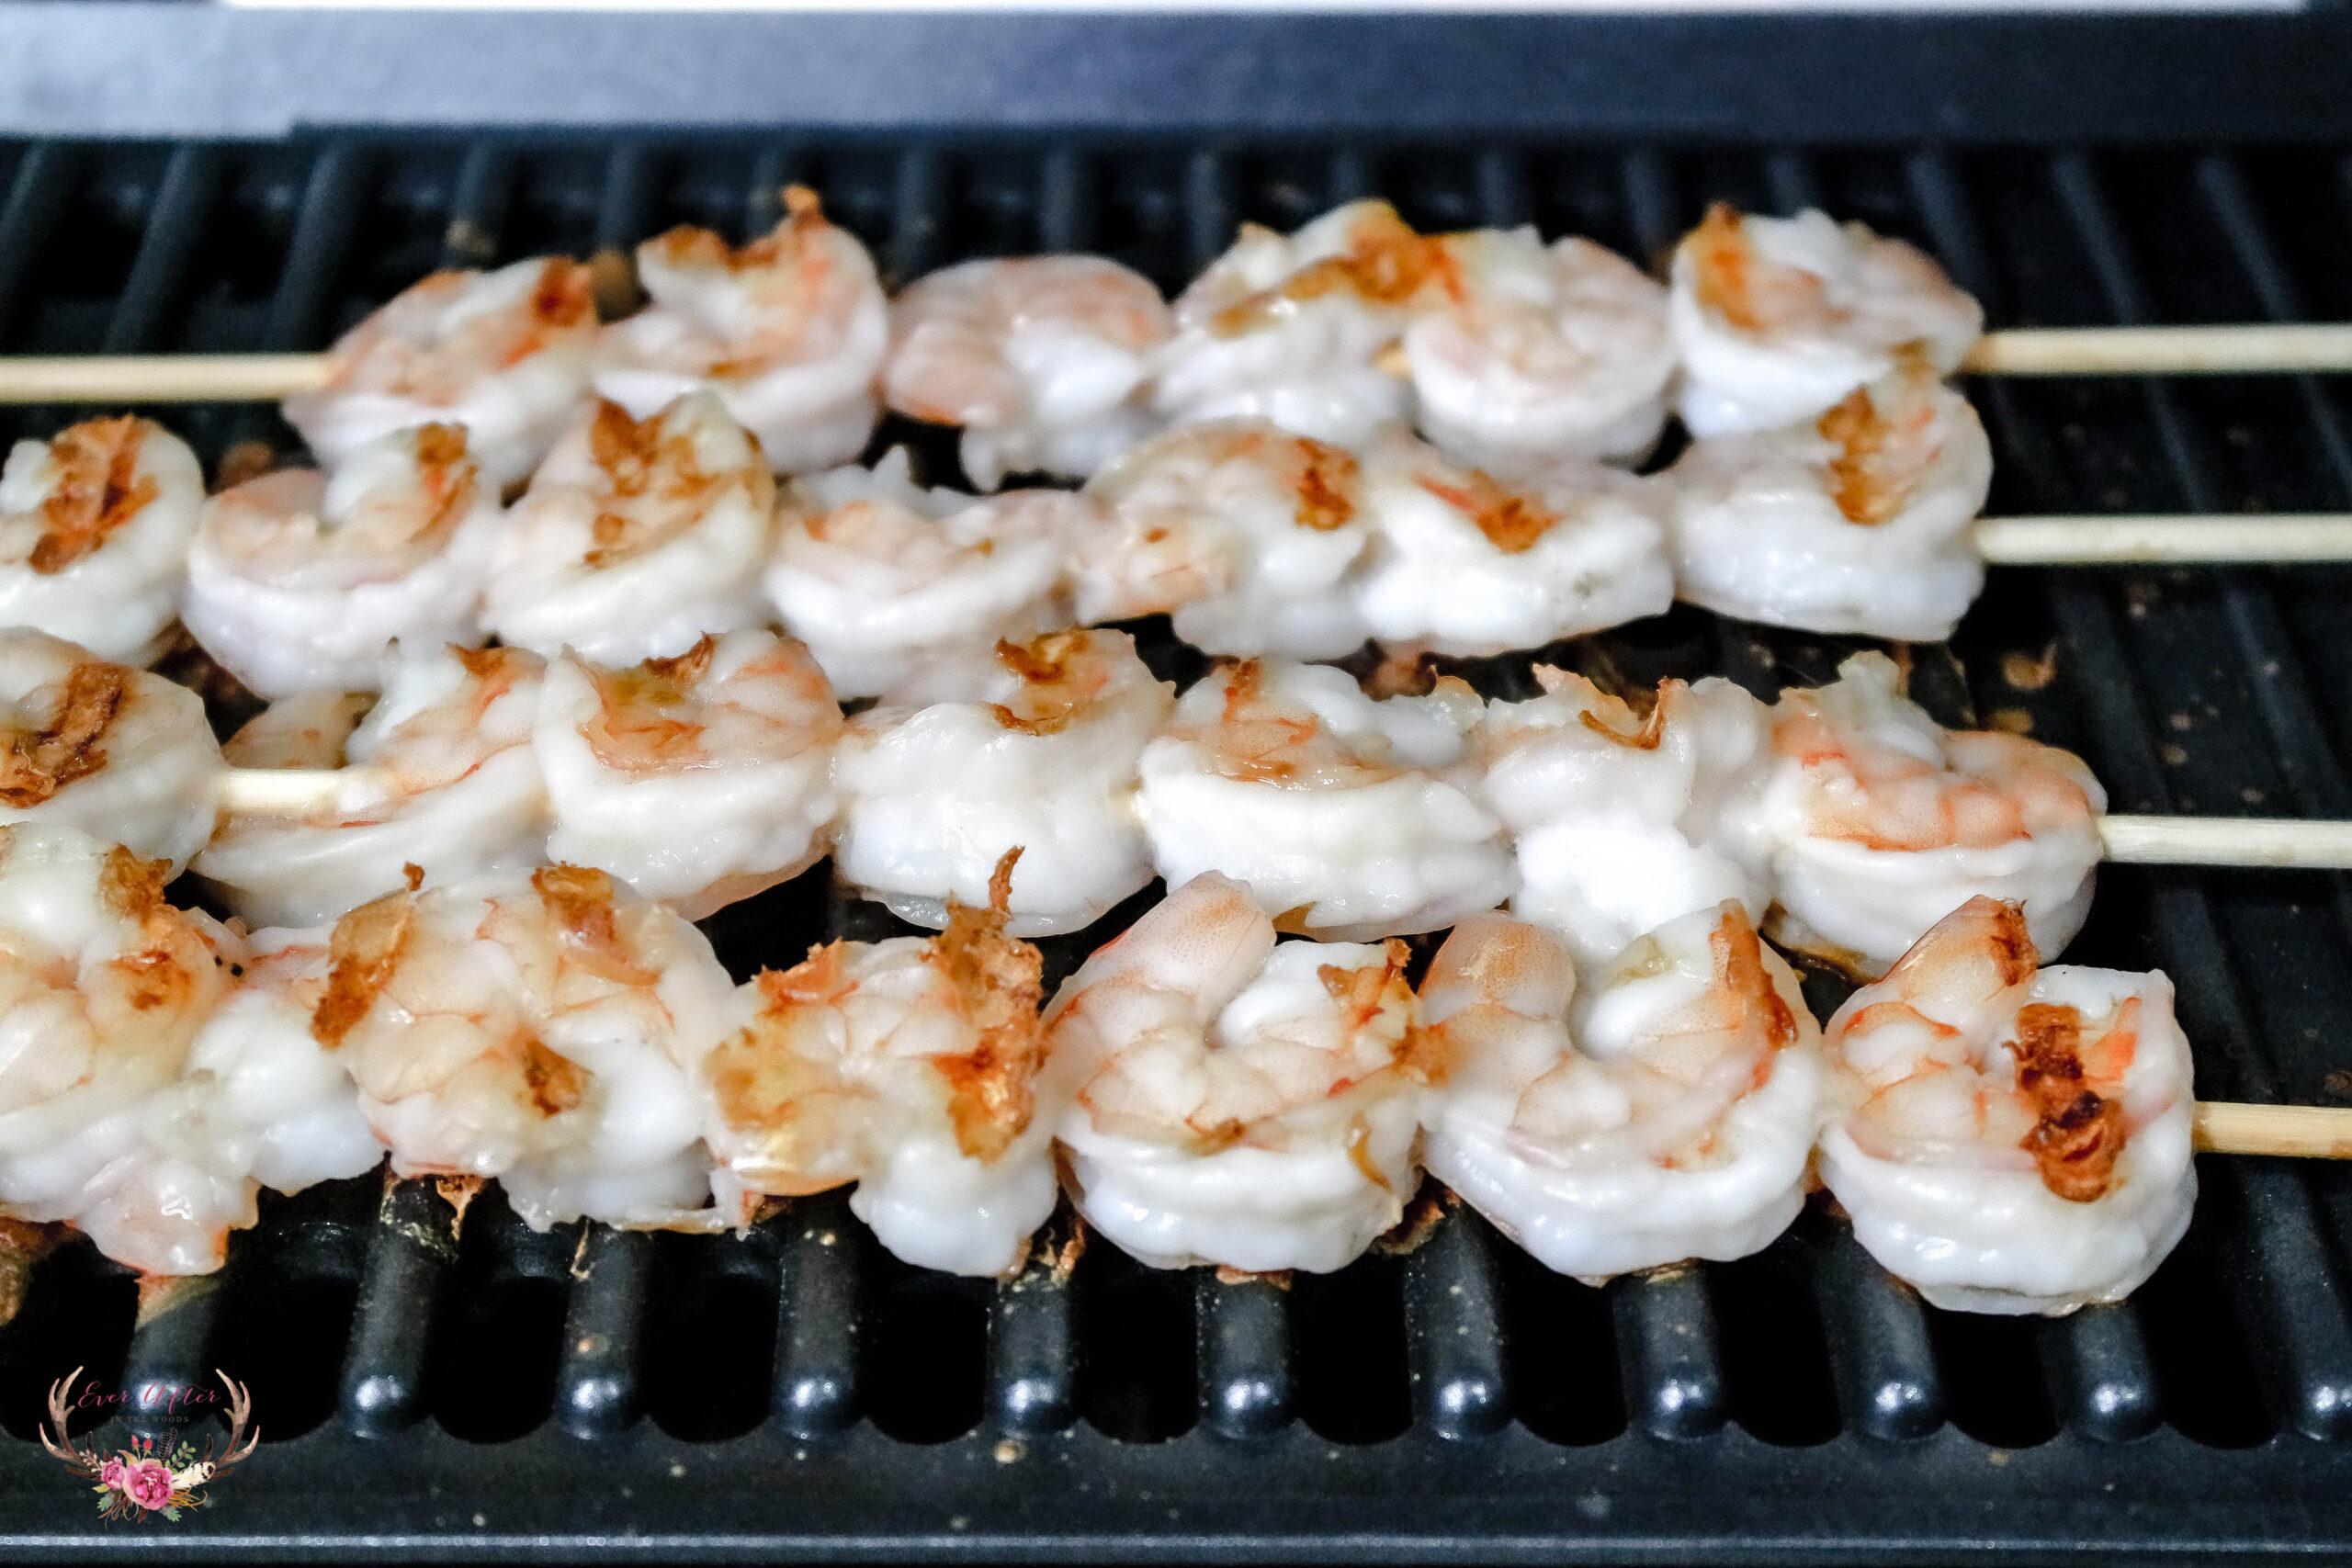 hamilton beach indoor searing grill